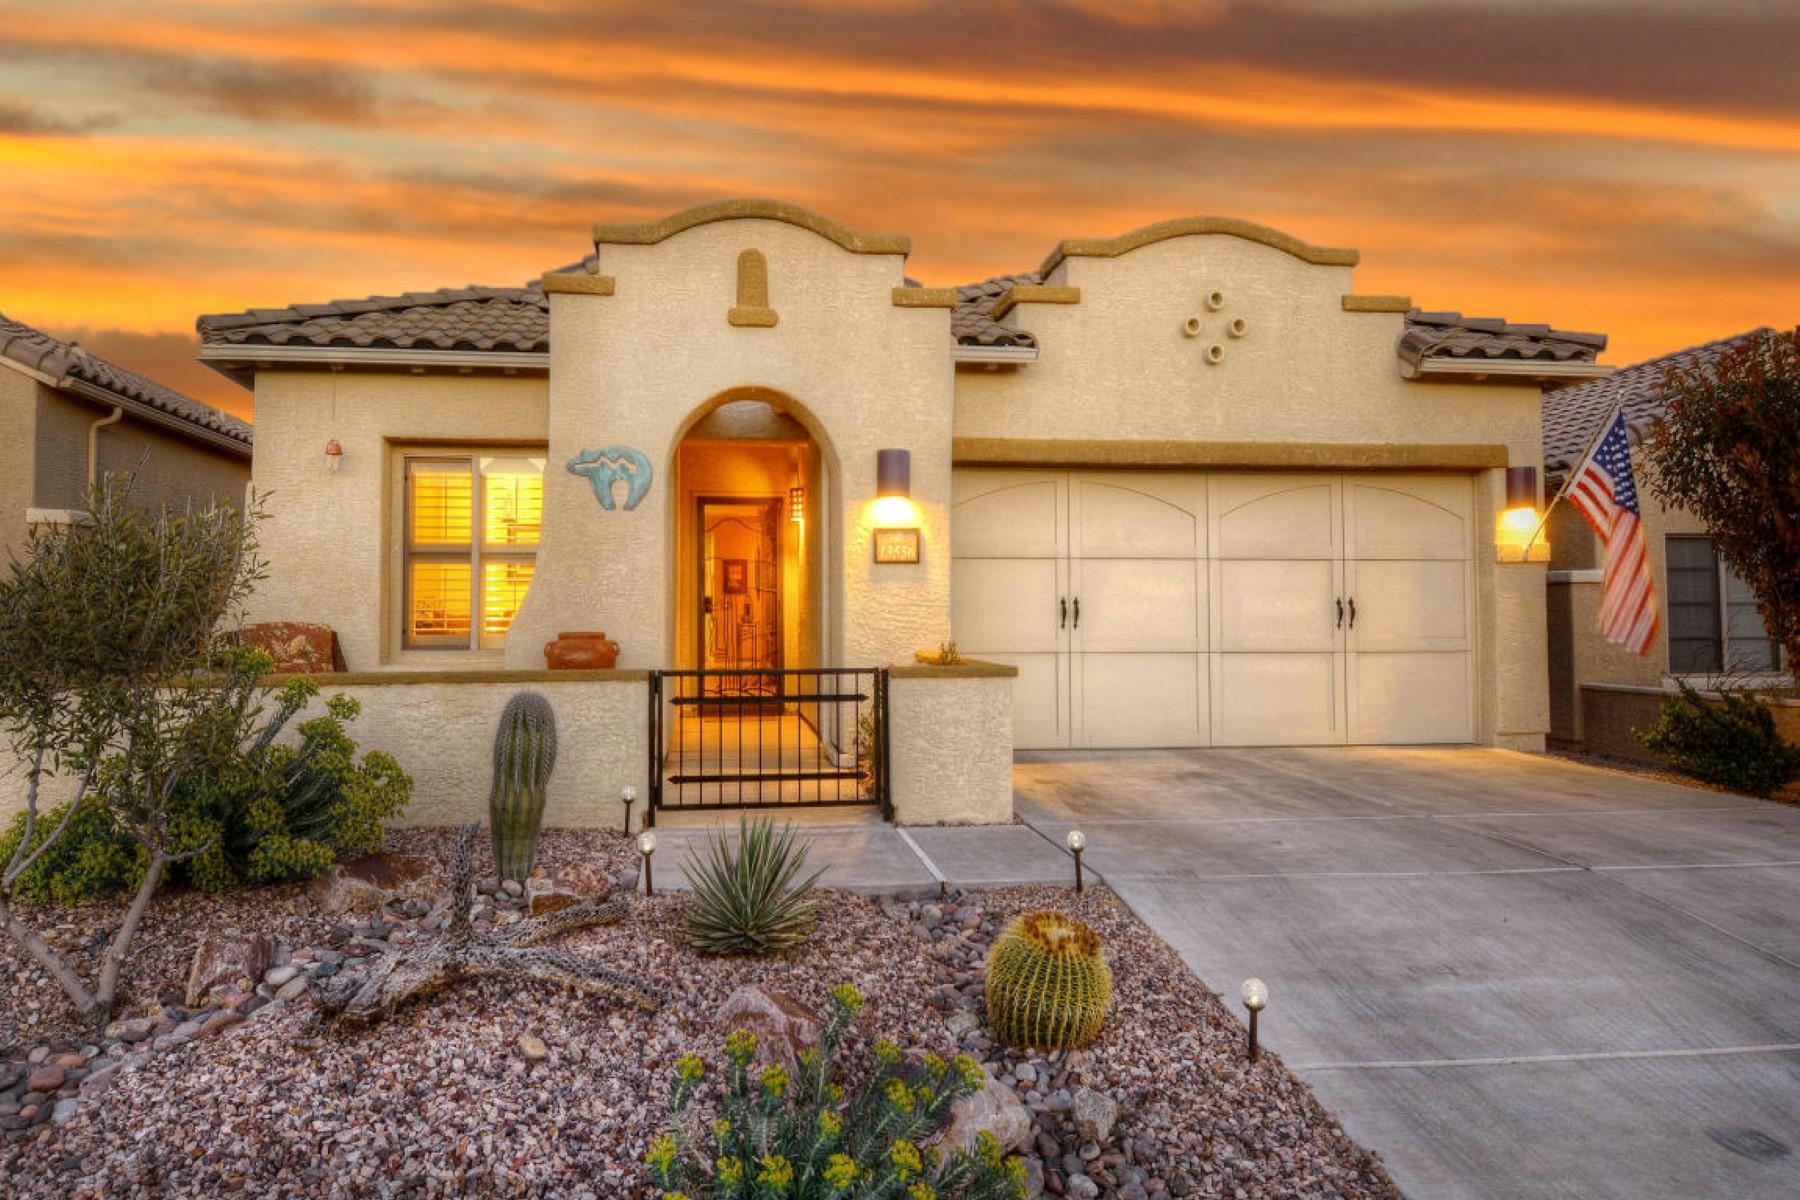 Villa per Vendita alle ore Charming home with breathtaking views 13556 N Atalaya Way Tucson, Arizona, 85755 Stati Uniti